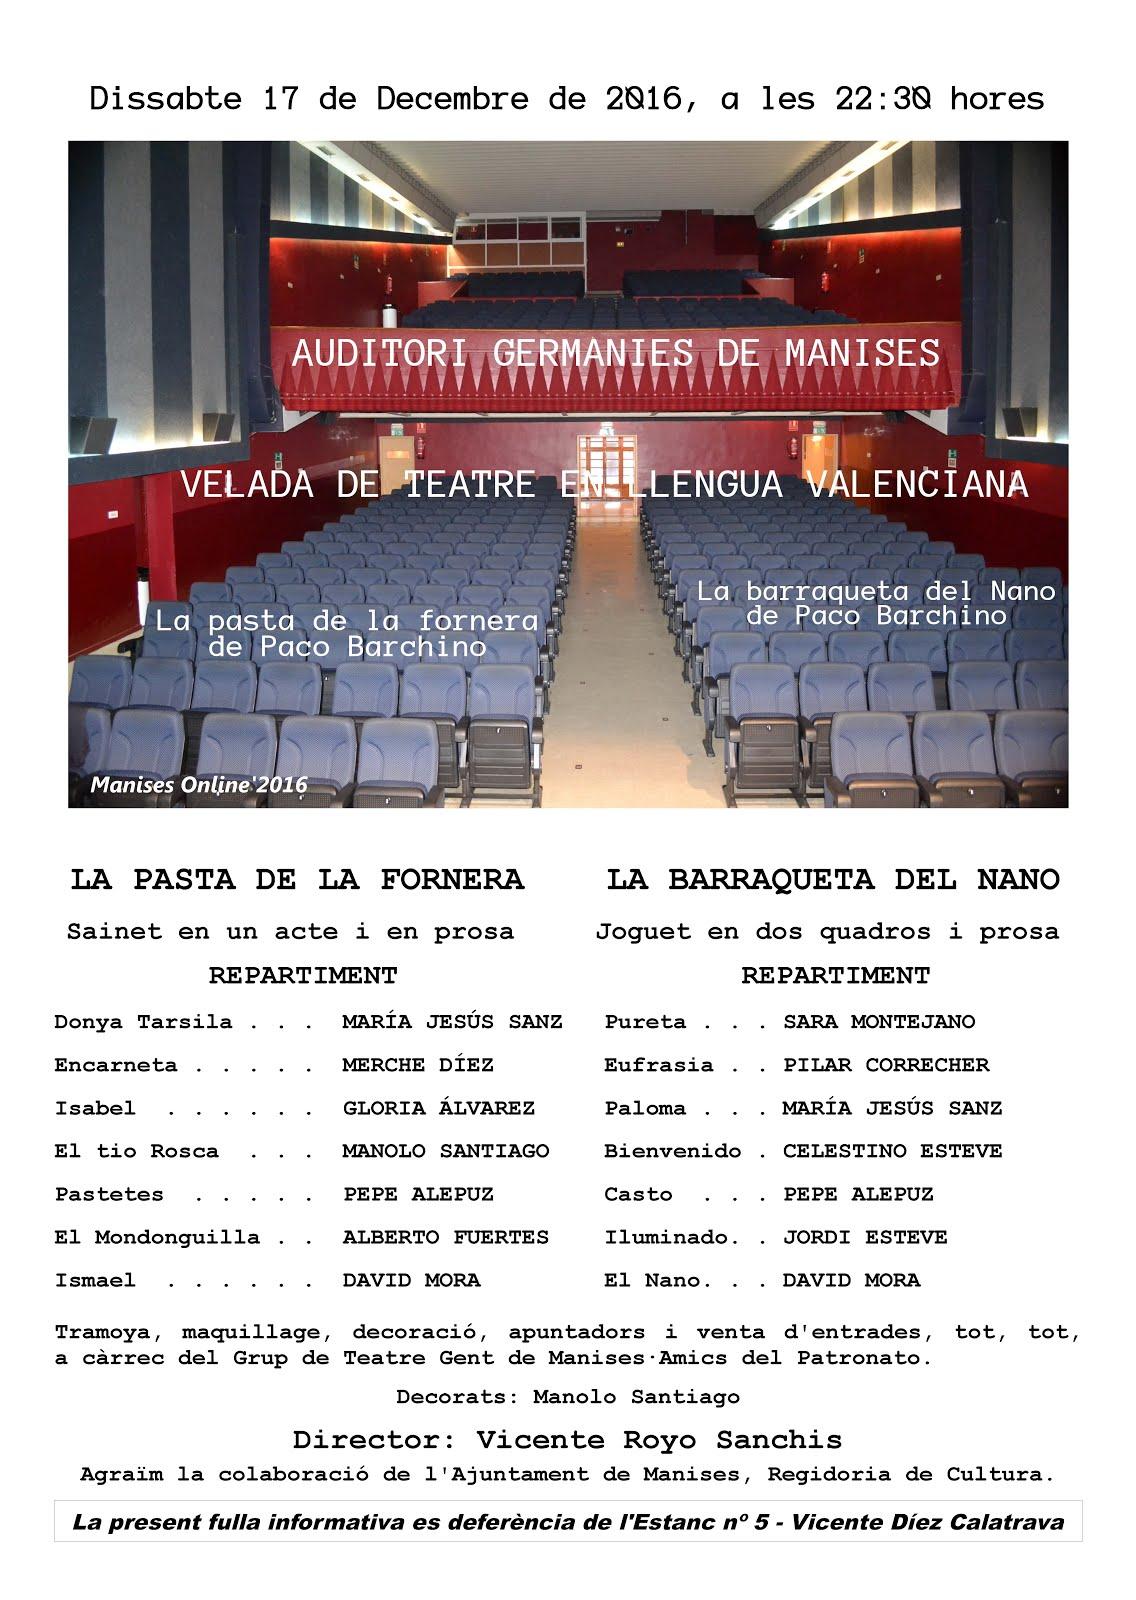 17.12.16 VELADA DE TEATRO EN LENGUA VALENCIANA POR EL GRUP GENT DE MANISES · AMICS DEL PATRONATO.